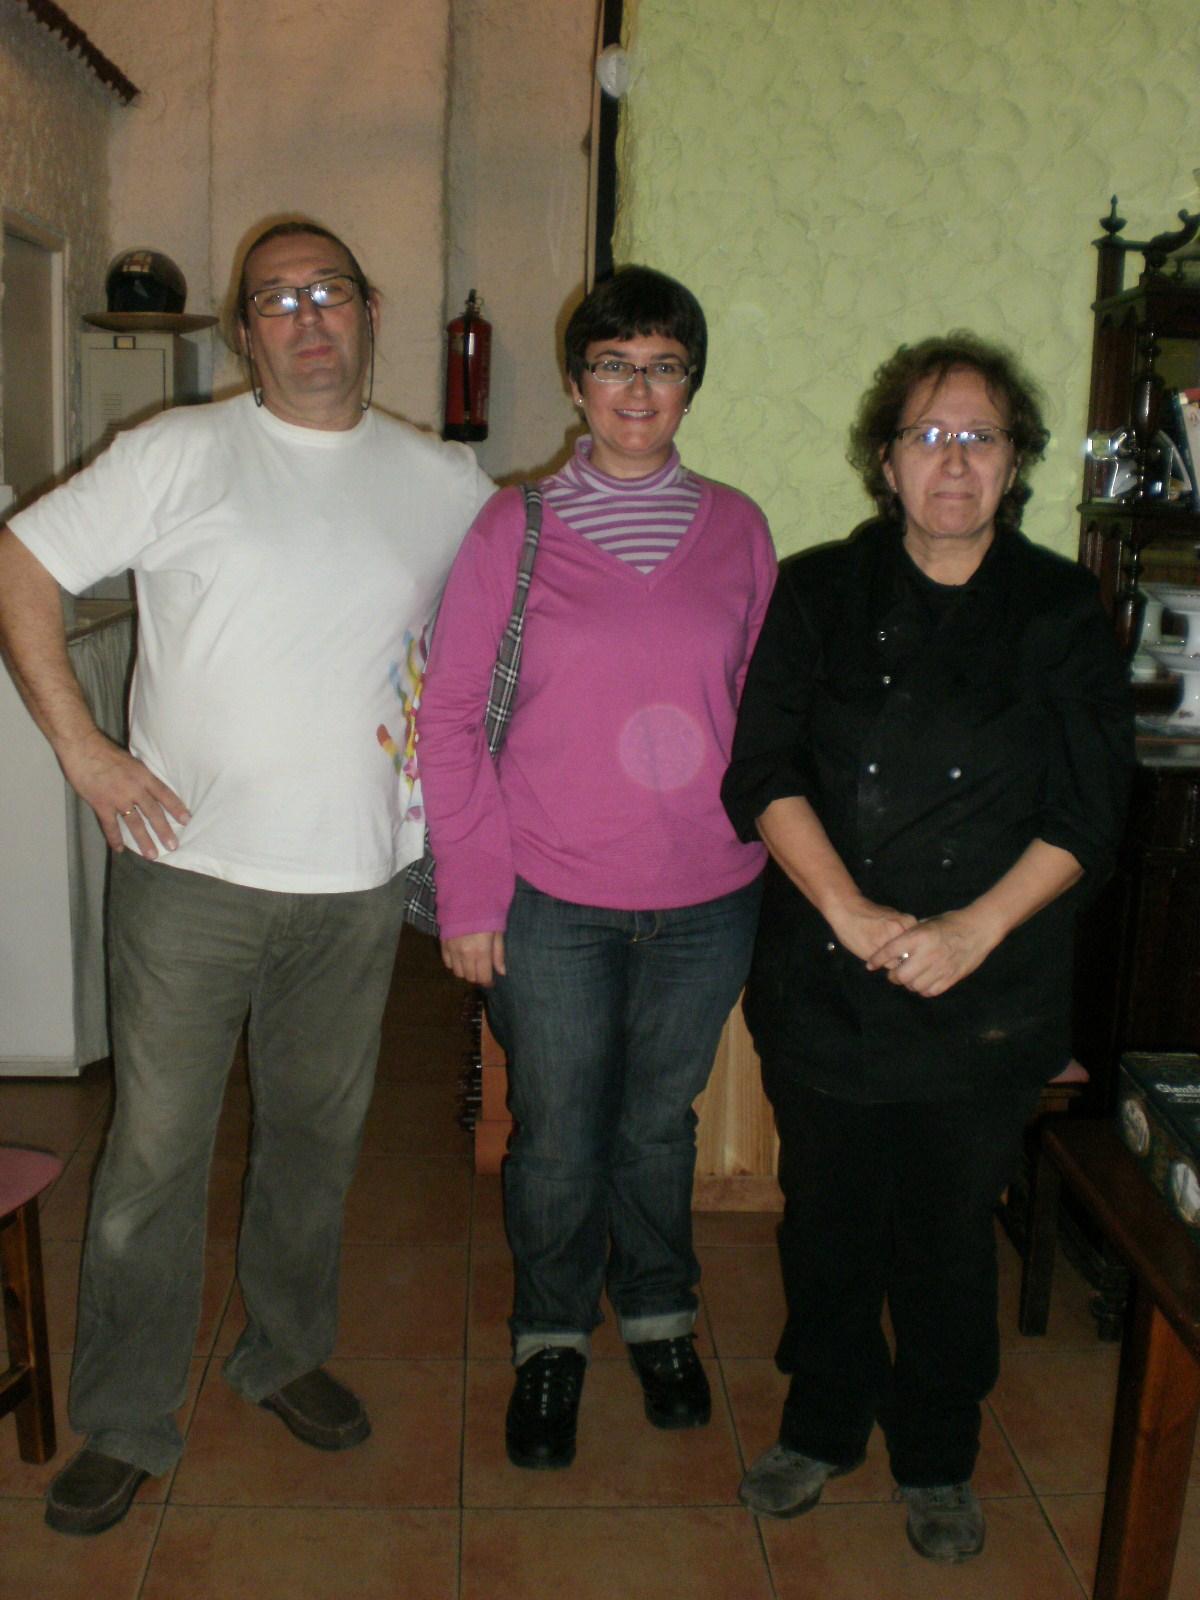 Eventos en sevilla febrero 2012 for Espectaculos en sevilla